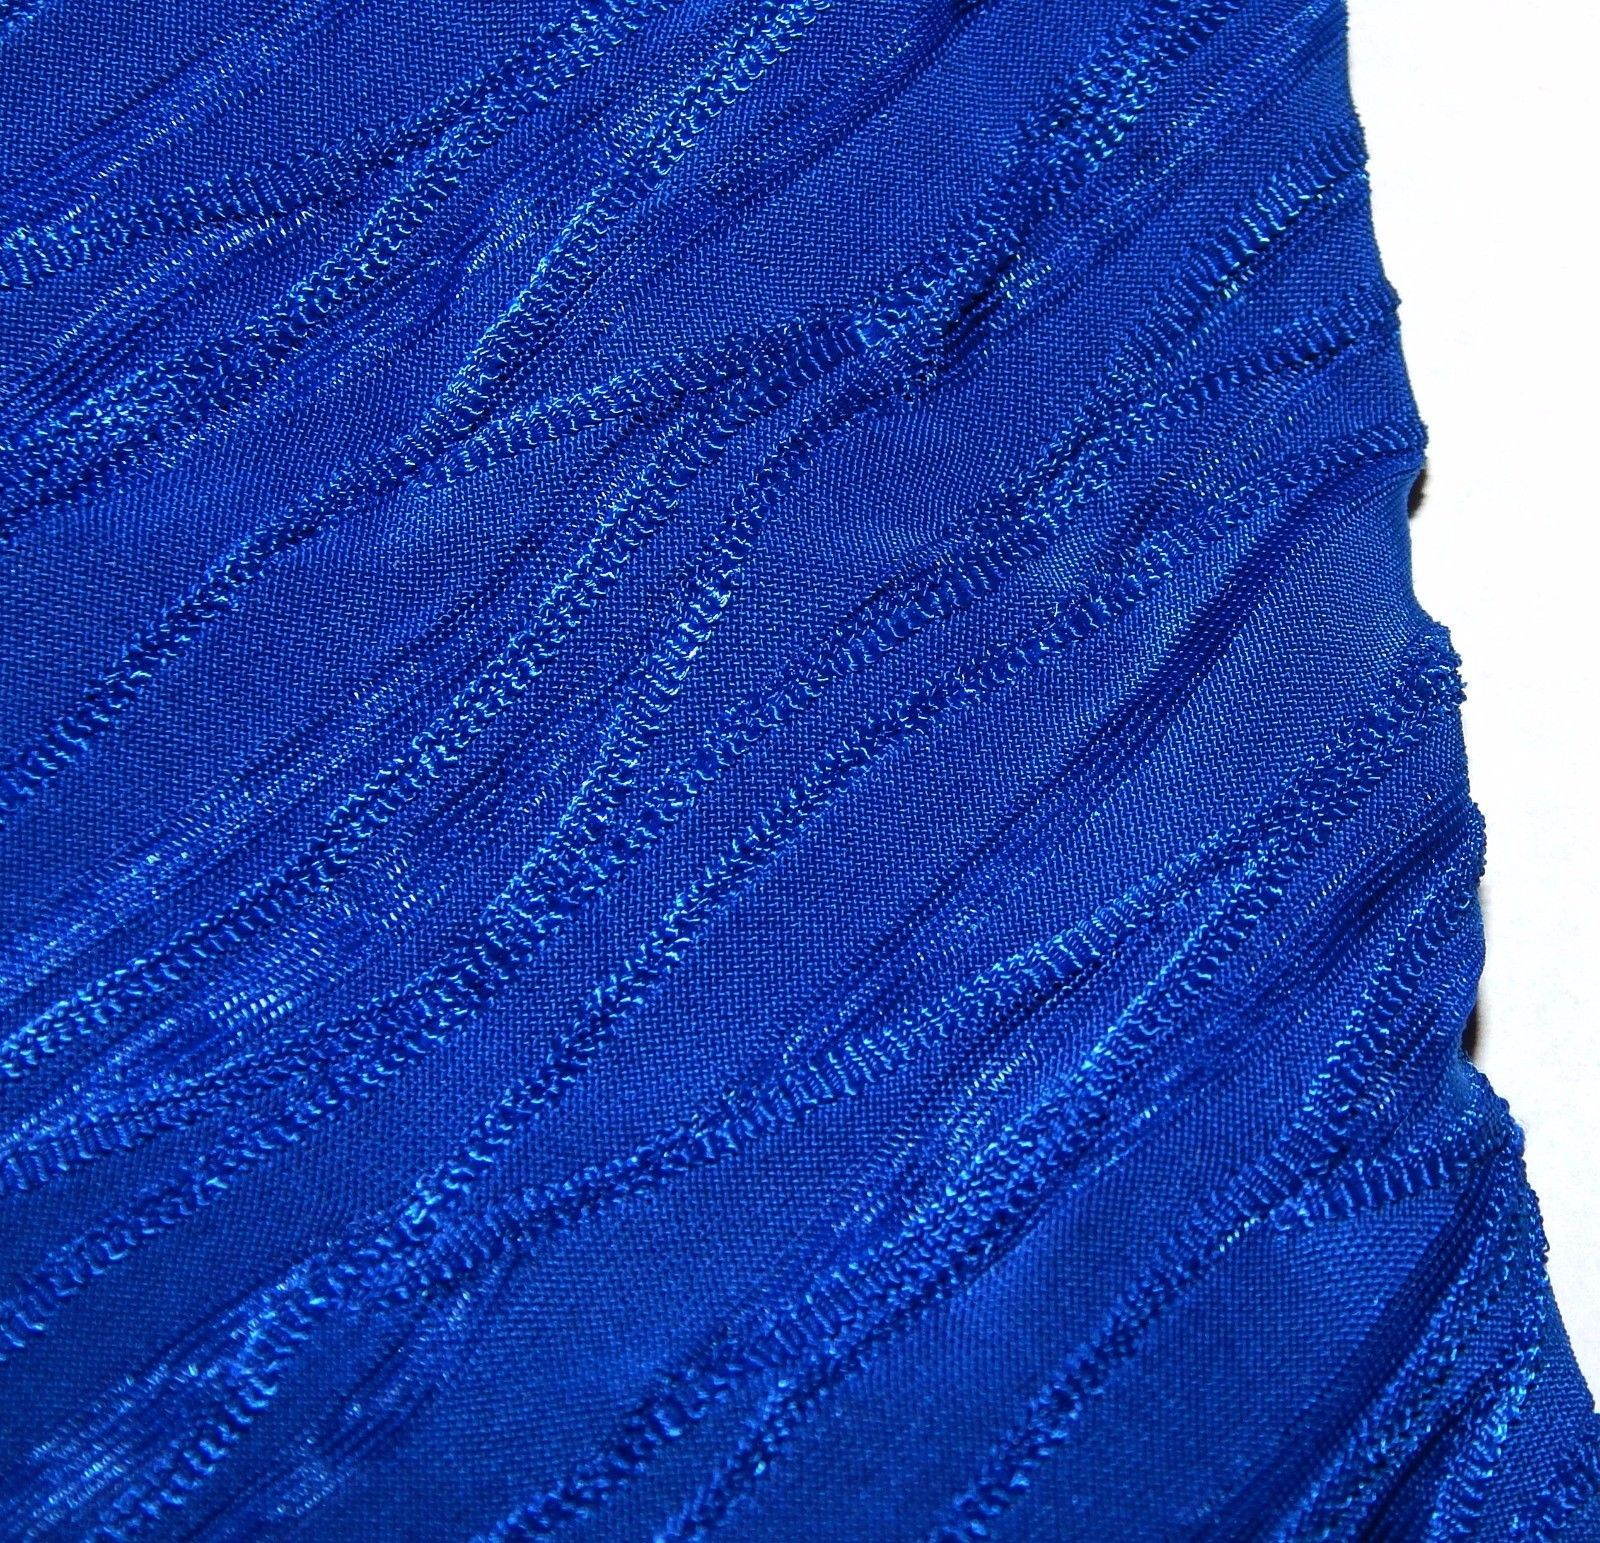 Dana Buchman Textured V-Neck Top & Tank Blue Crush Womens Size M L XL NEW $44